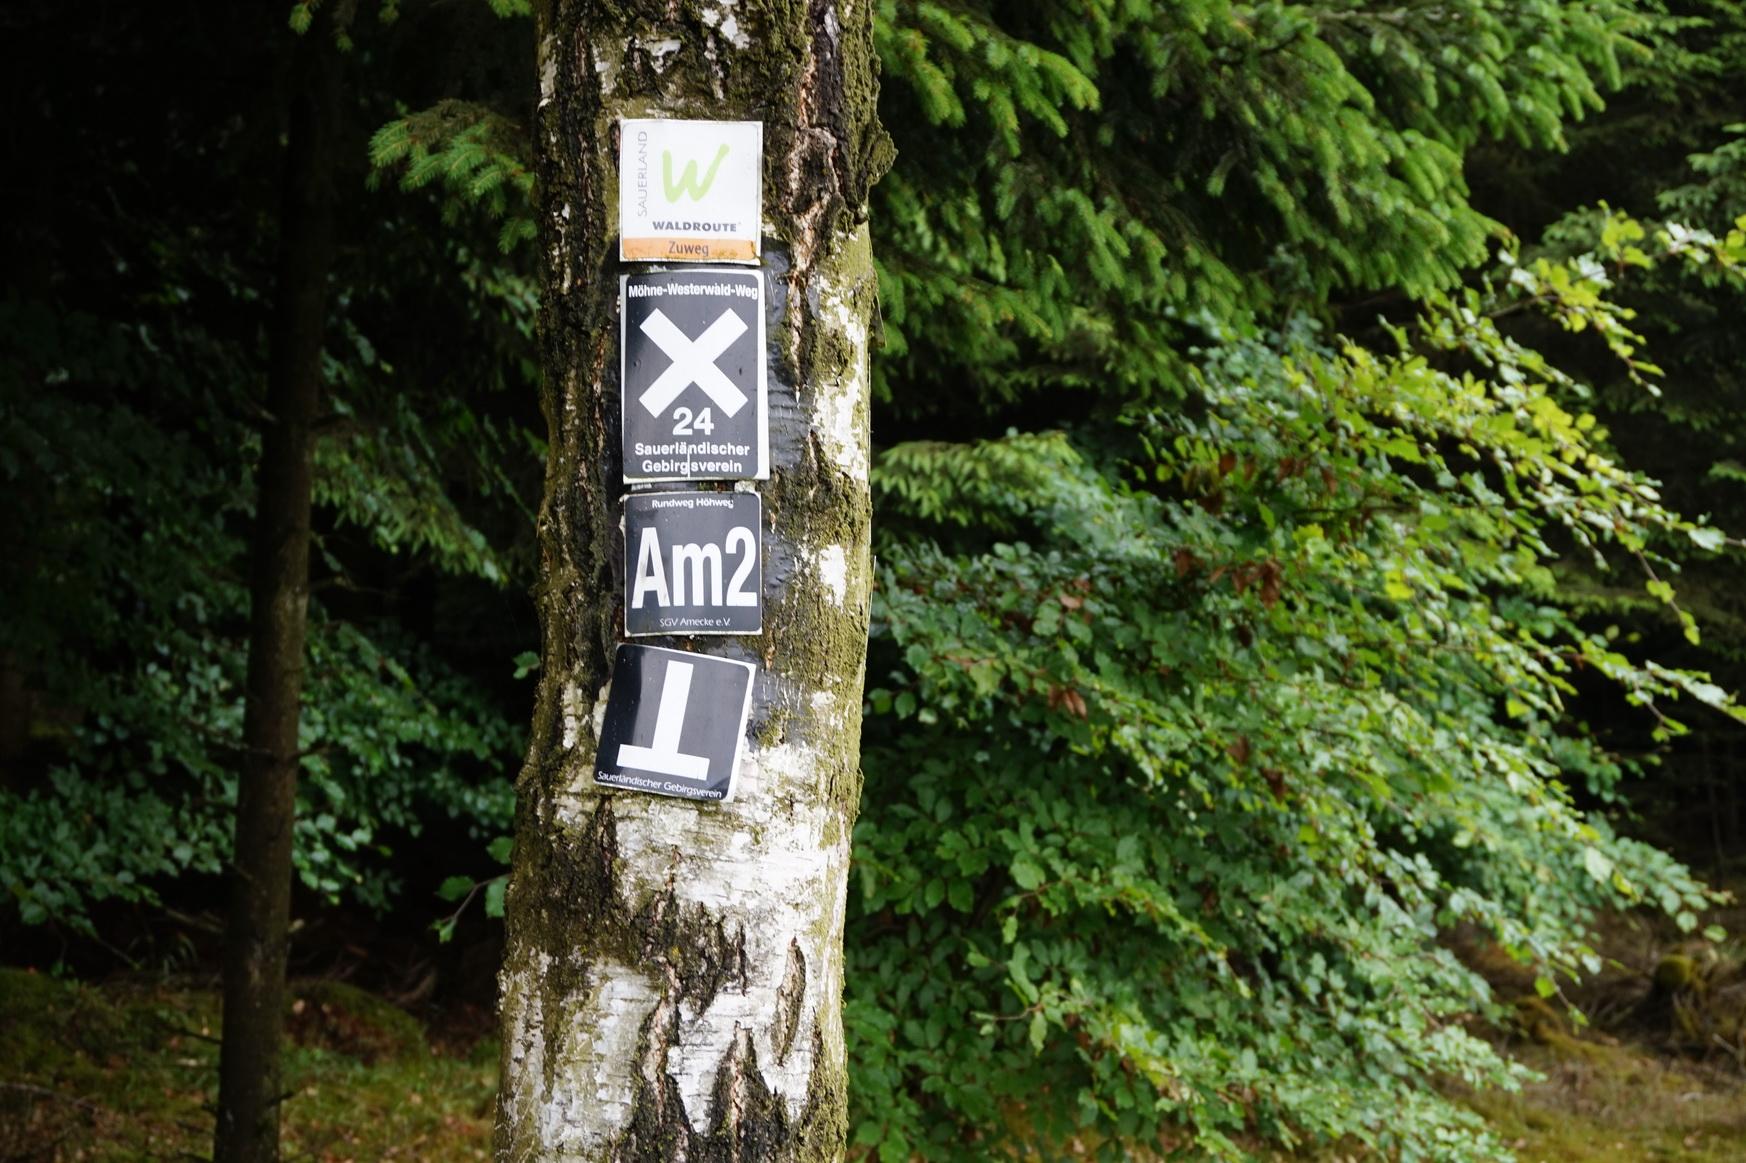 Wanderung Am2 Amecke Sauerland